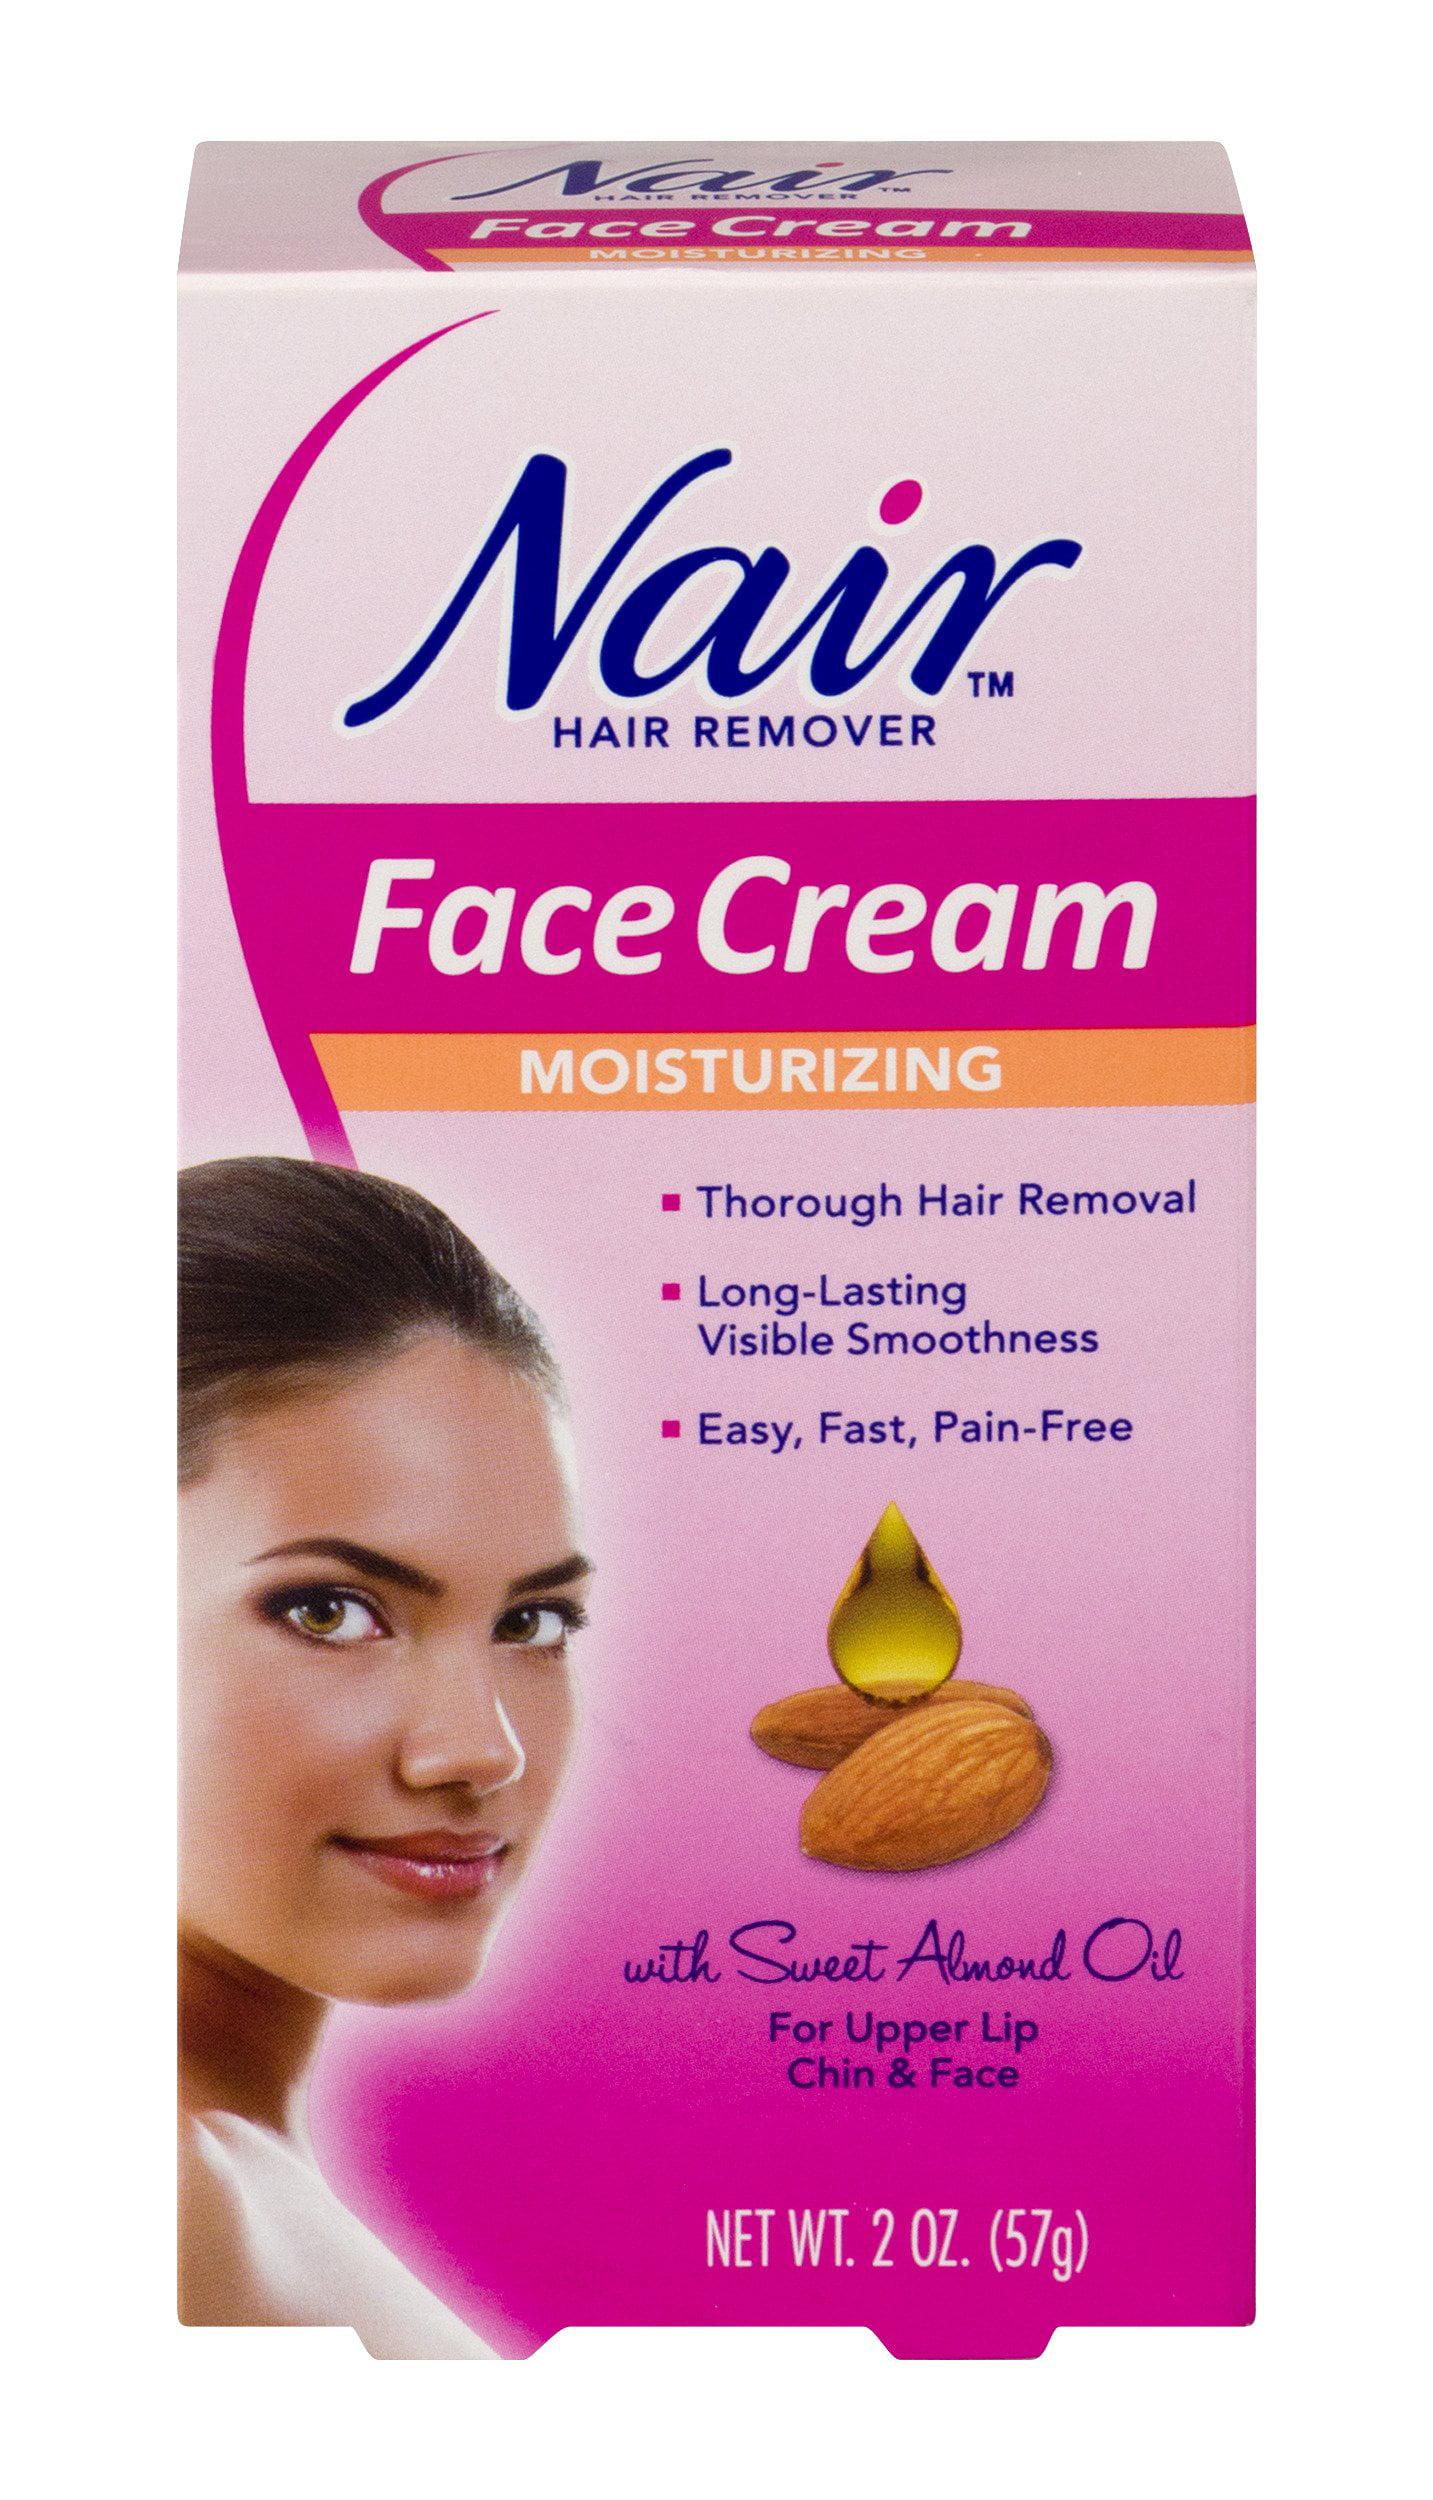 Nair Hair Remover Face Cream Moisturizing For Upper Lip Chin